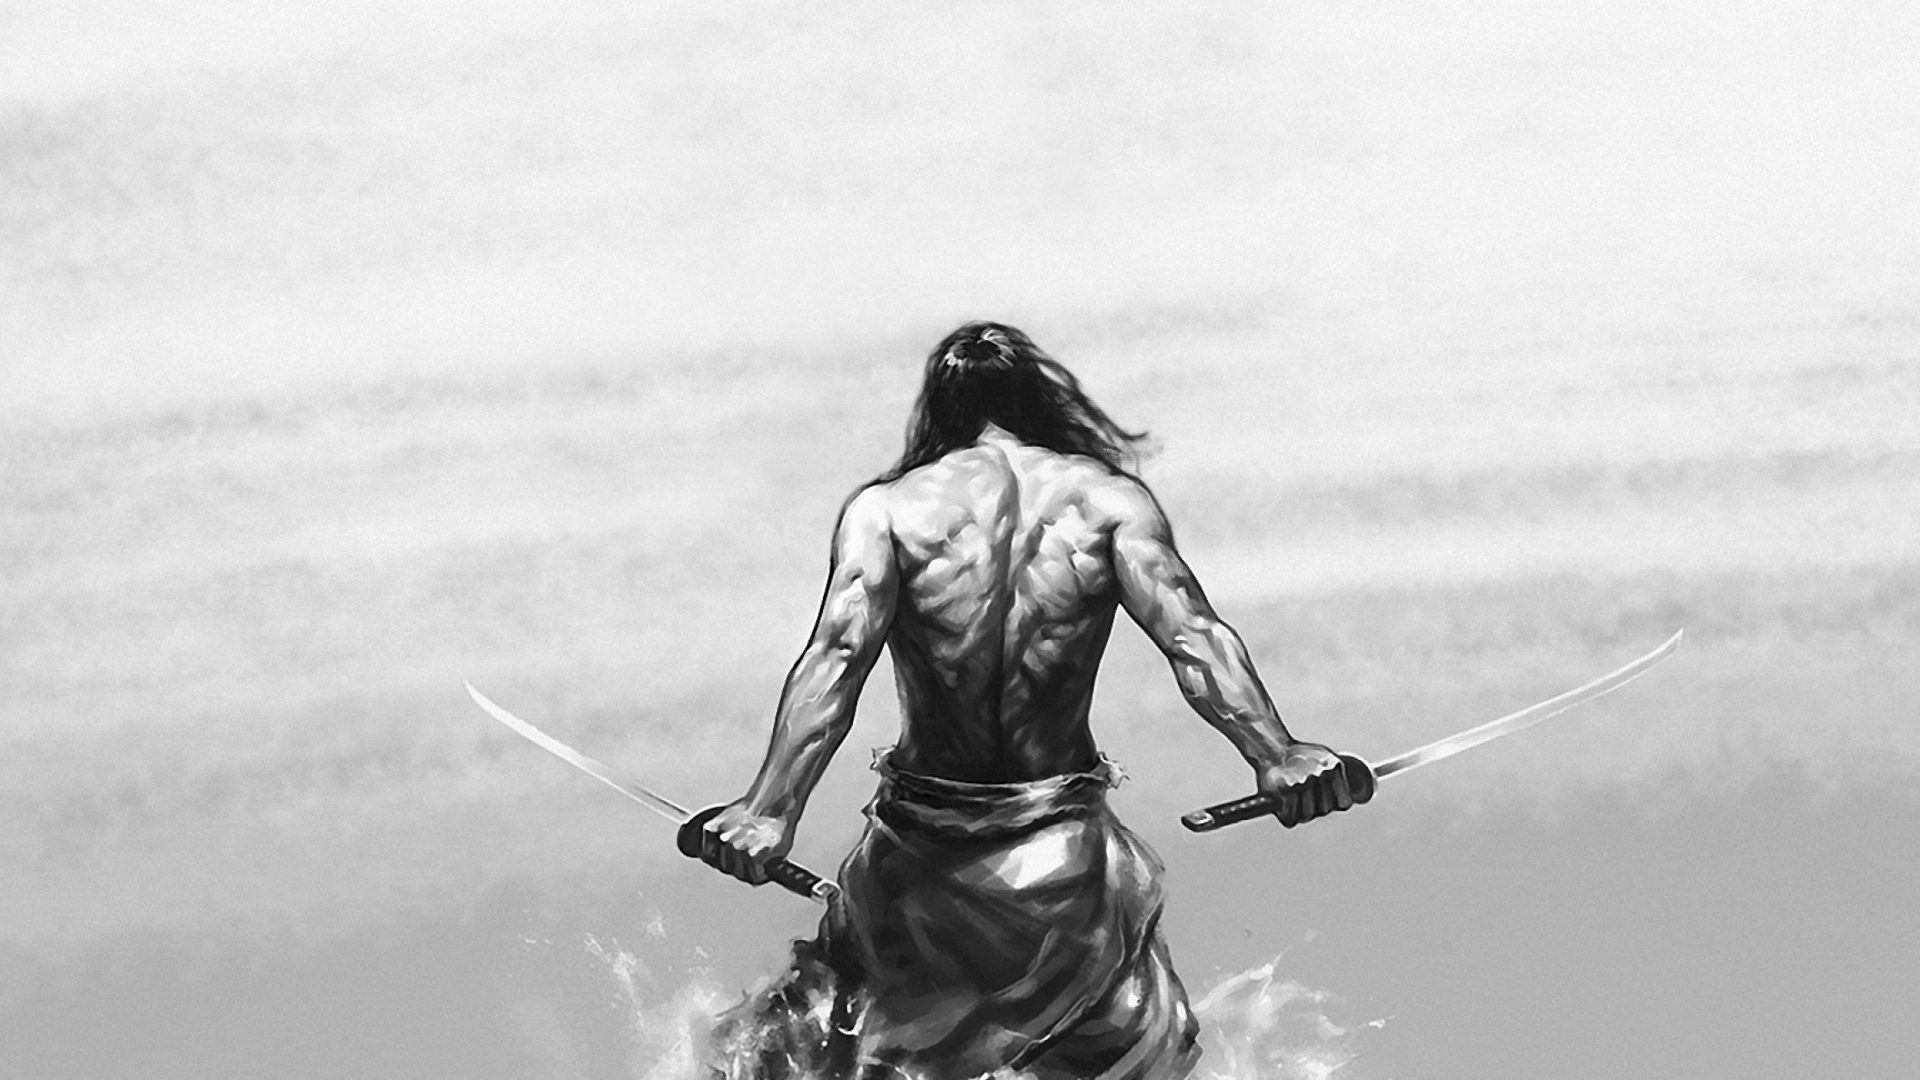 Samurai Fighter Swords Gladiator Long Hairs Warrior Artwork Fantasy Drawing